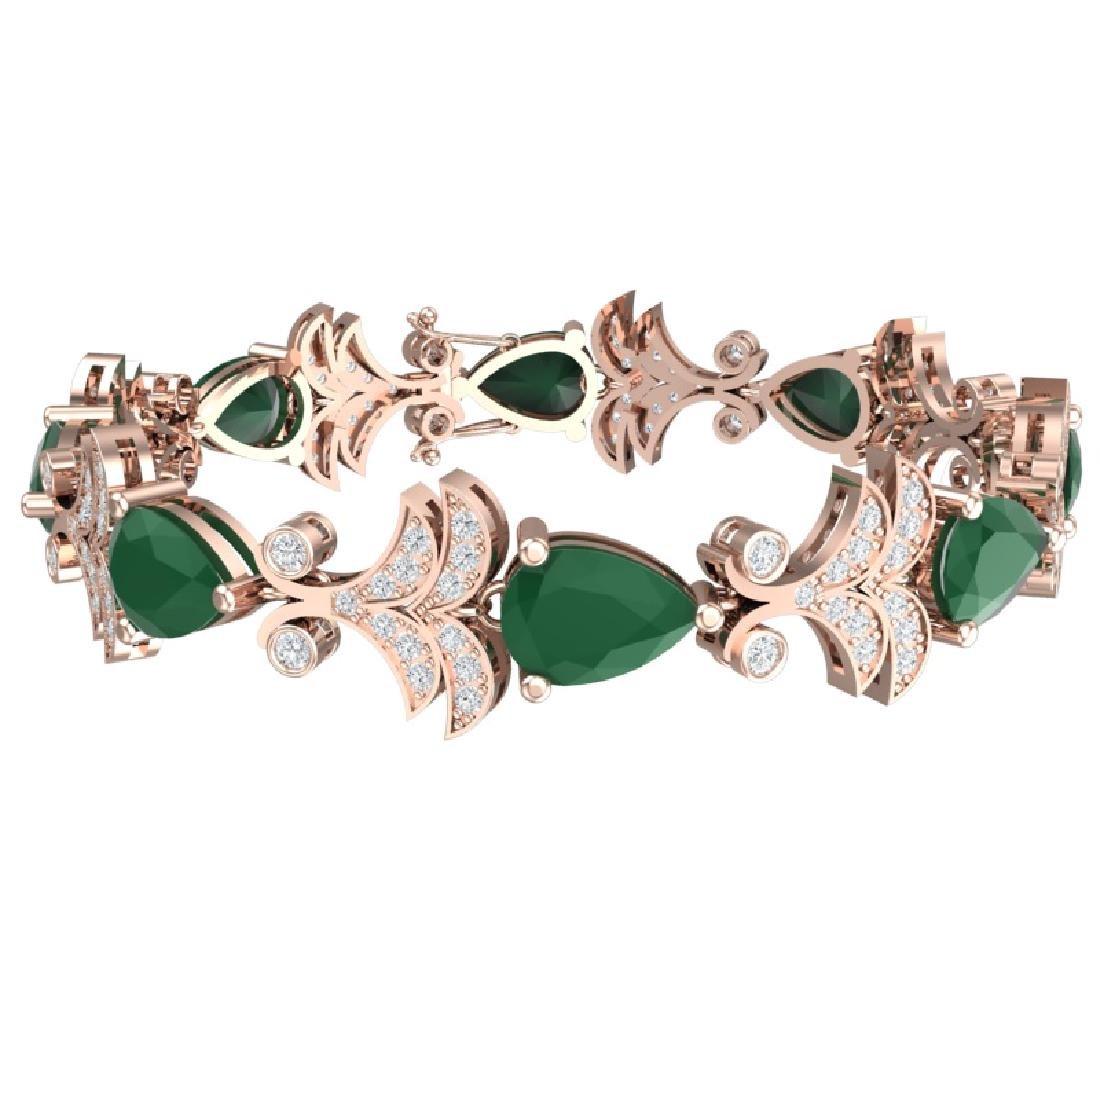 24.8 CTW Royalty Emerald & VS Diamond Bracelet 18K Rose - 2